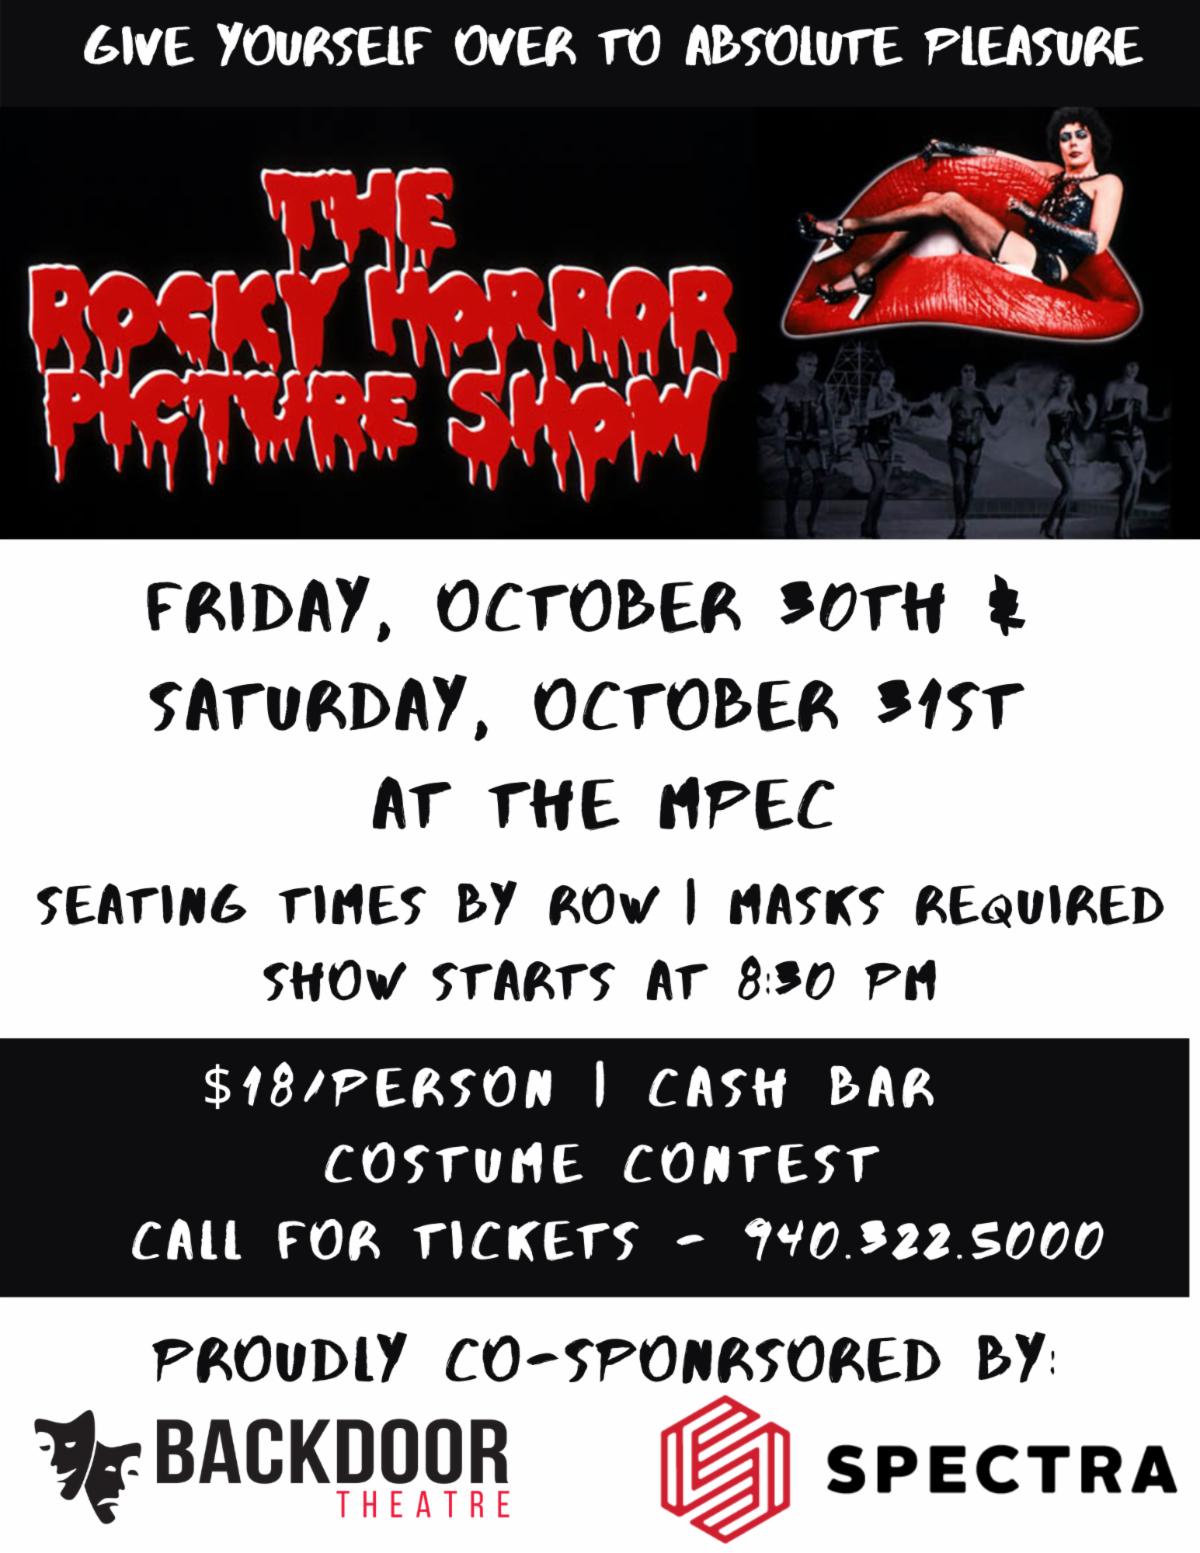 Backdoor Theatre Presents: Rocky Horror Picture Show @ MPEC - Ray Clymer Exhibit Hall - Seminar Room